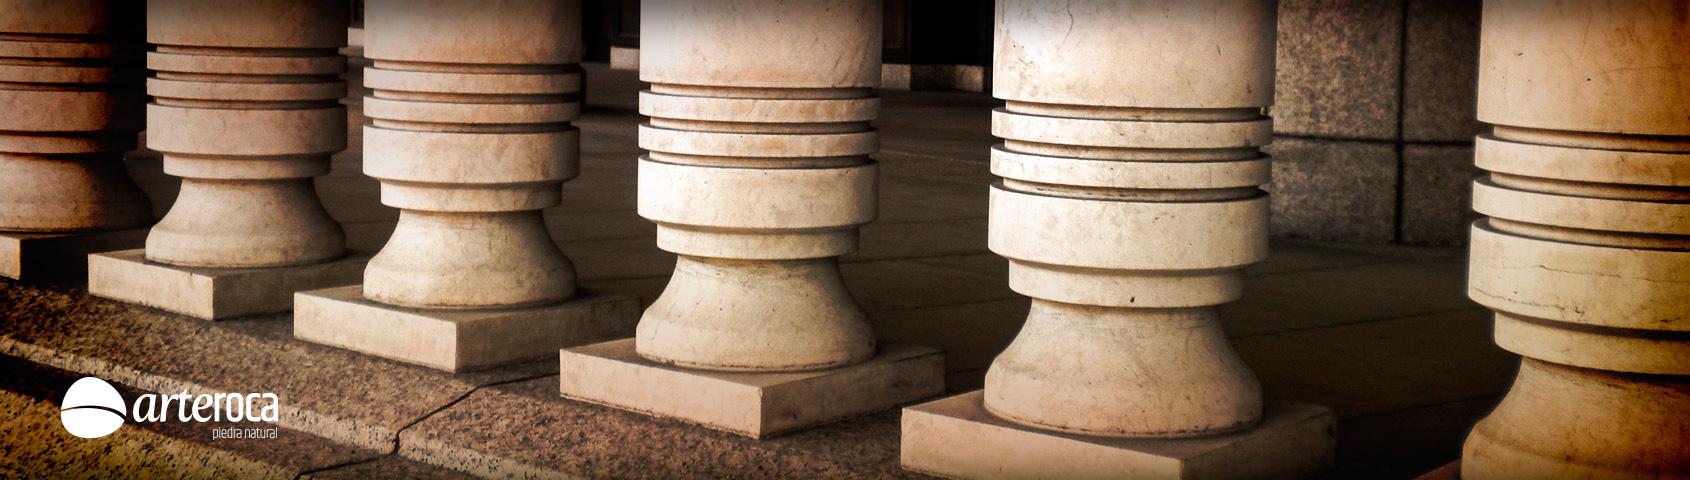 columnas arteroca